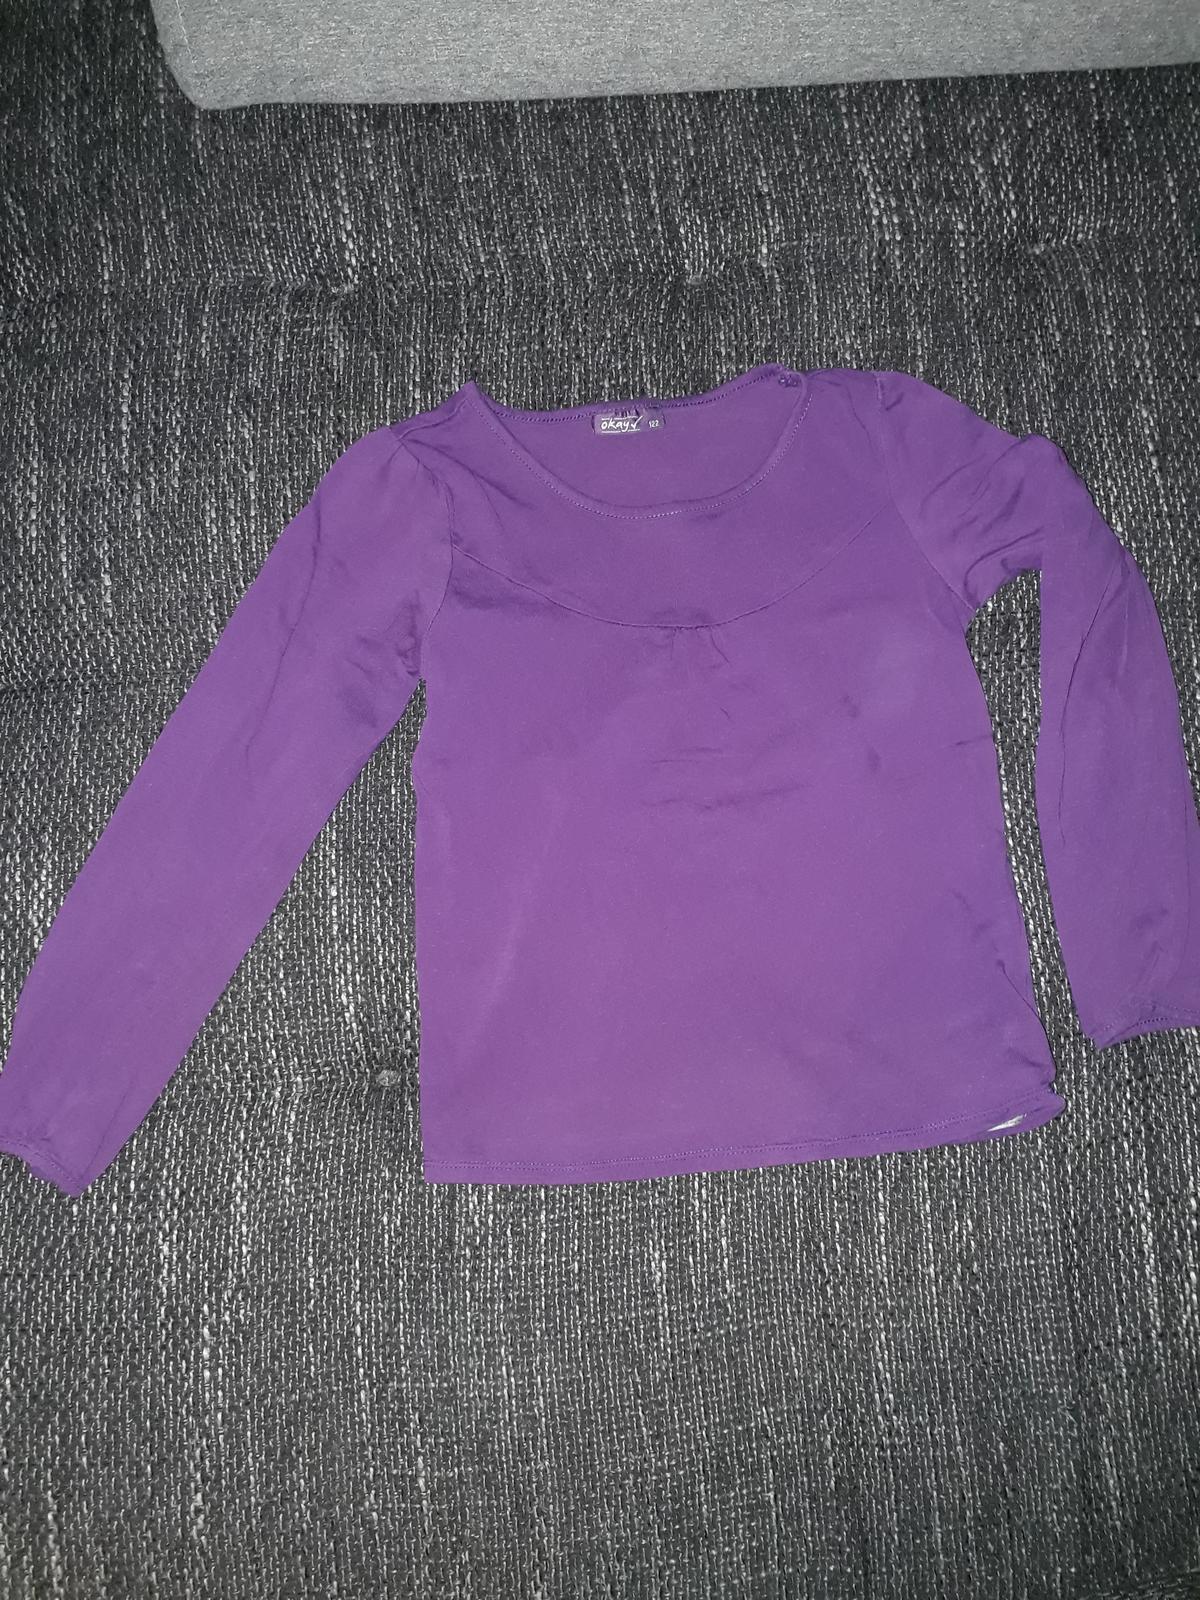 jednobarevné tričko Okey - Obrázek č. 1